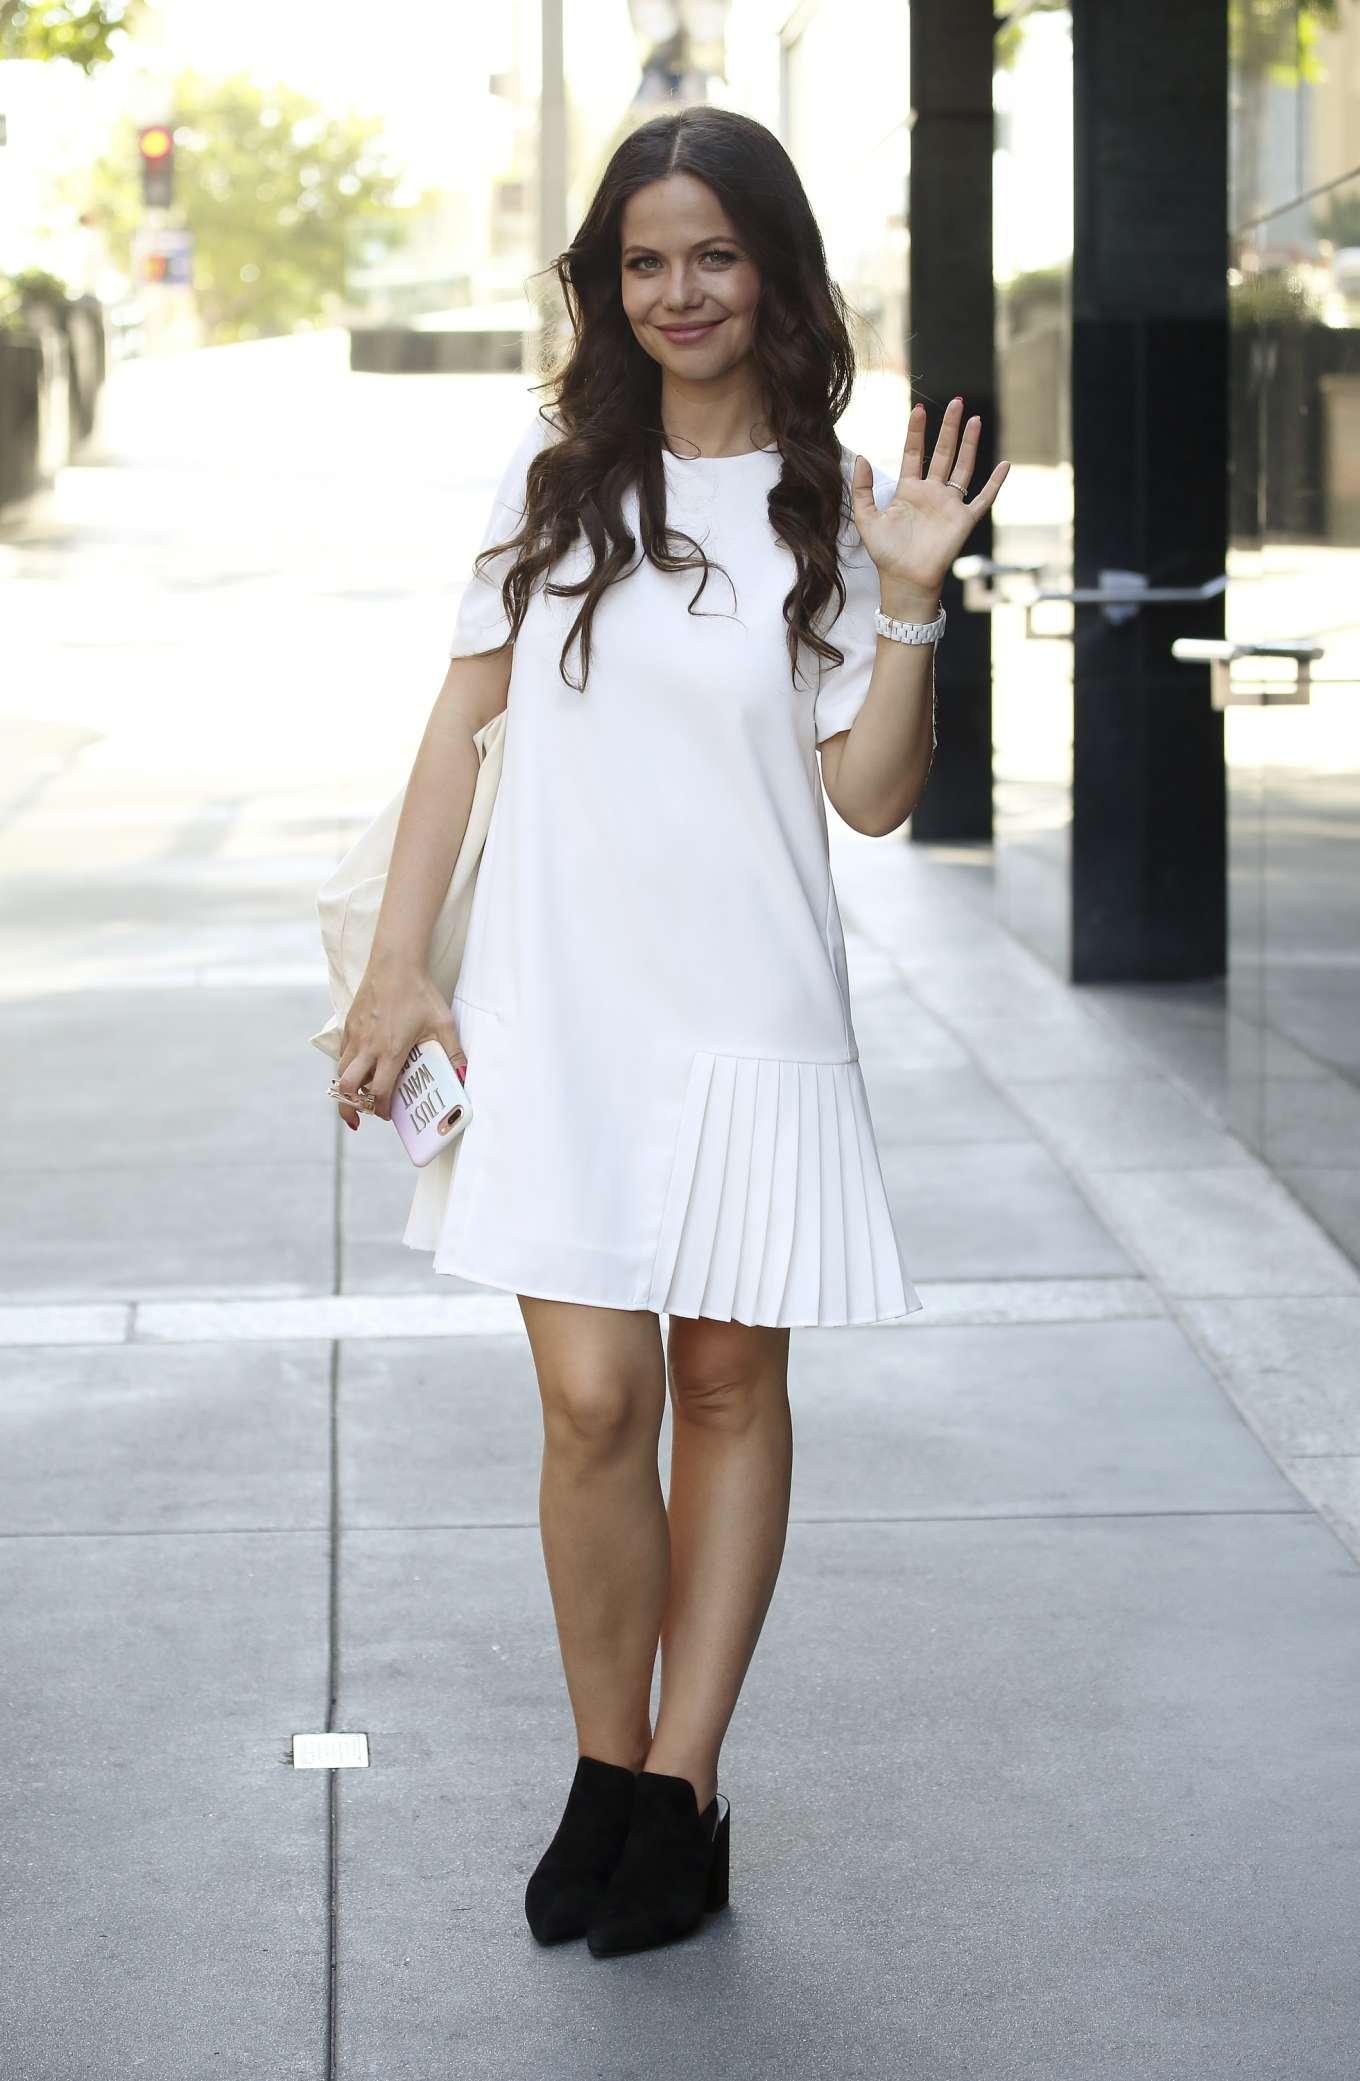 Tammin Sursok in White Mini Dress - Shopping in Los Angeles